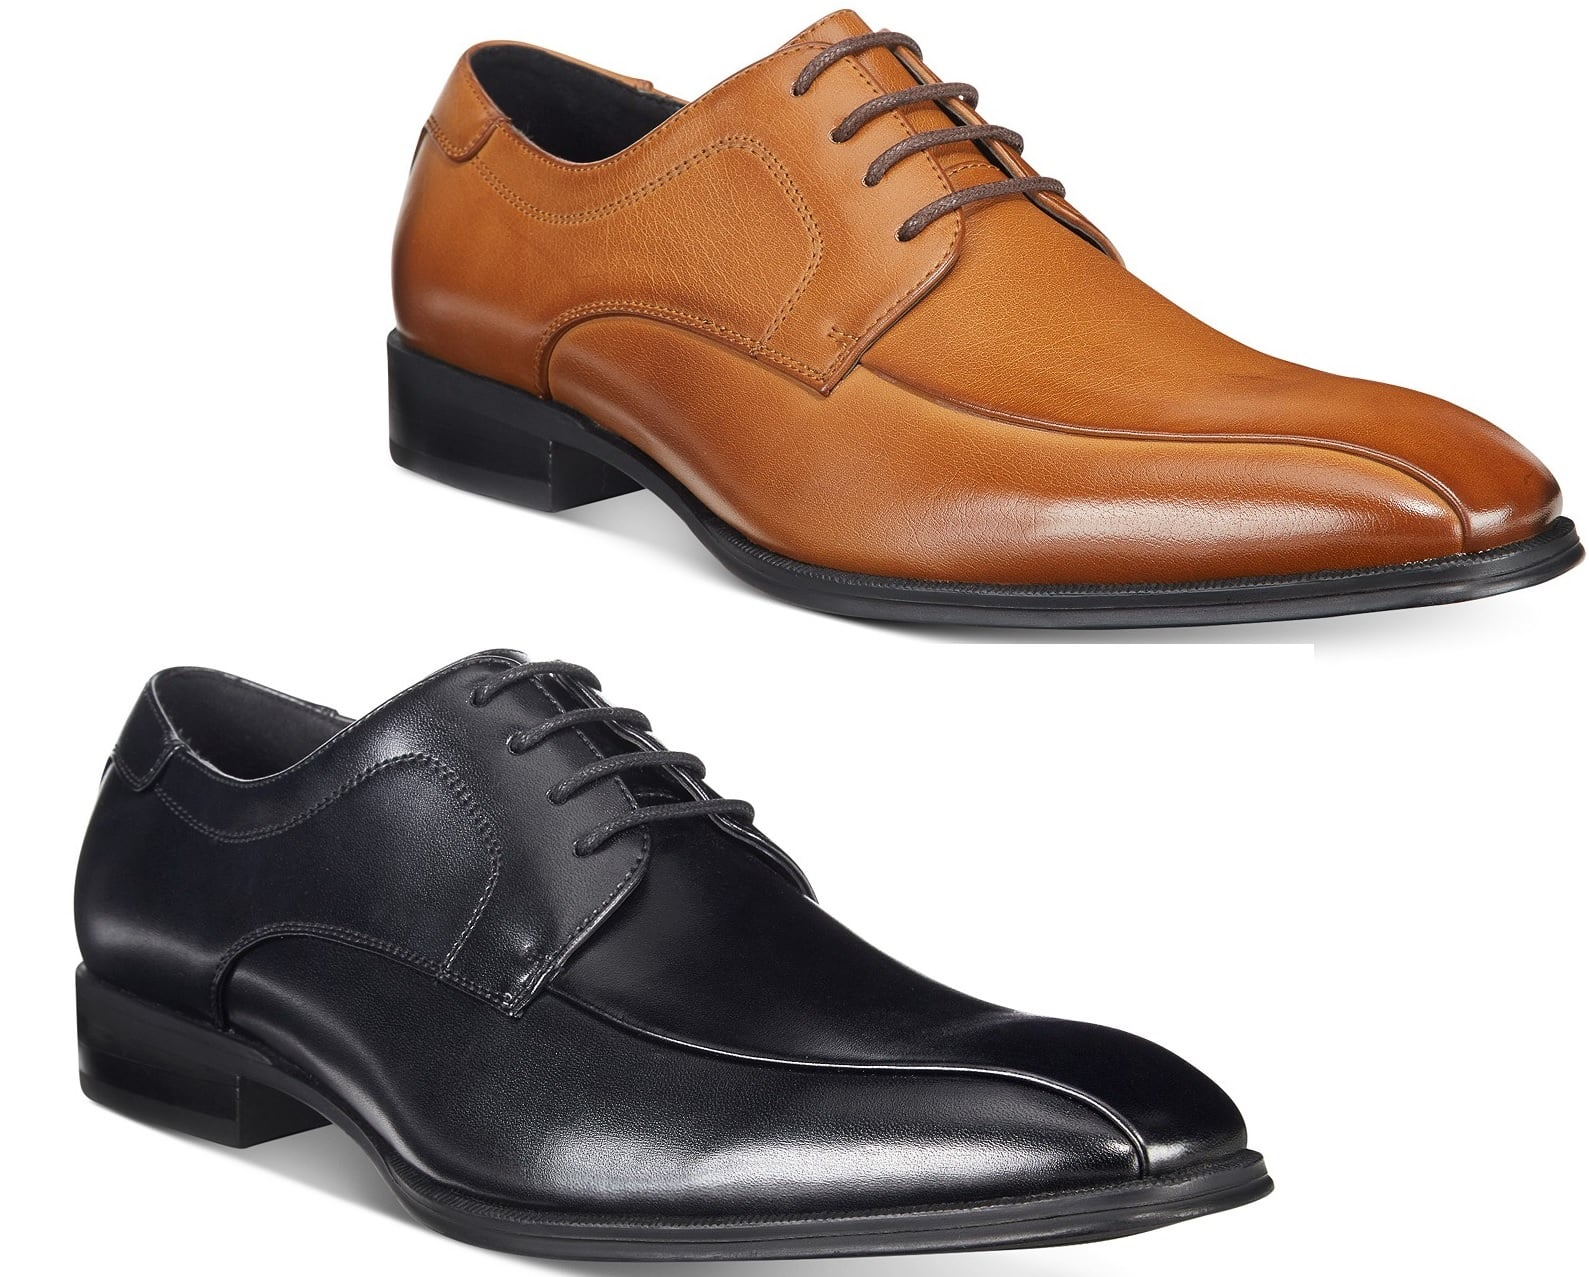 7d2e330f0 Alfani Men's Seth Bike Toe Derby Dress Shoes (Tan or Black) for $23.99 w